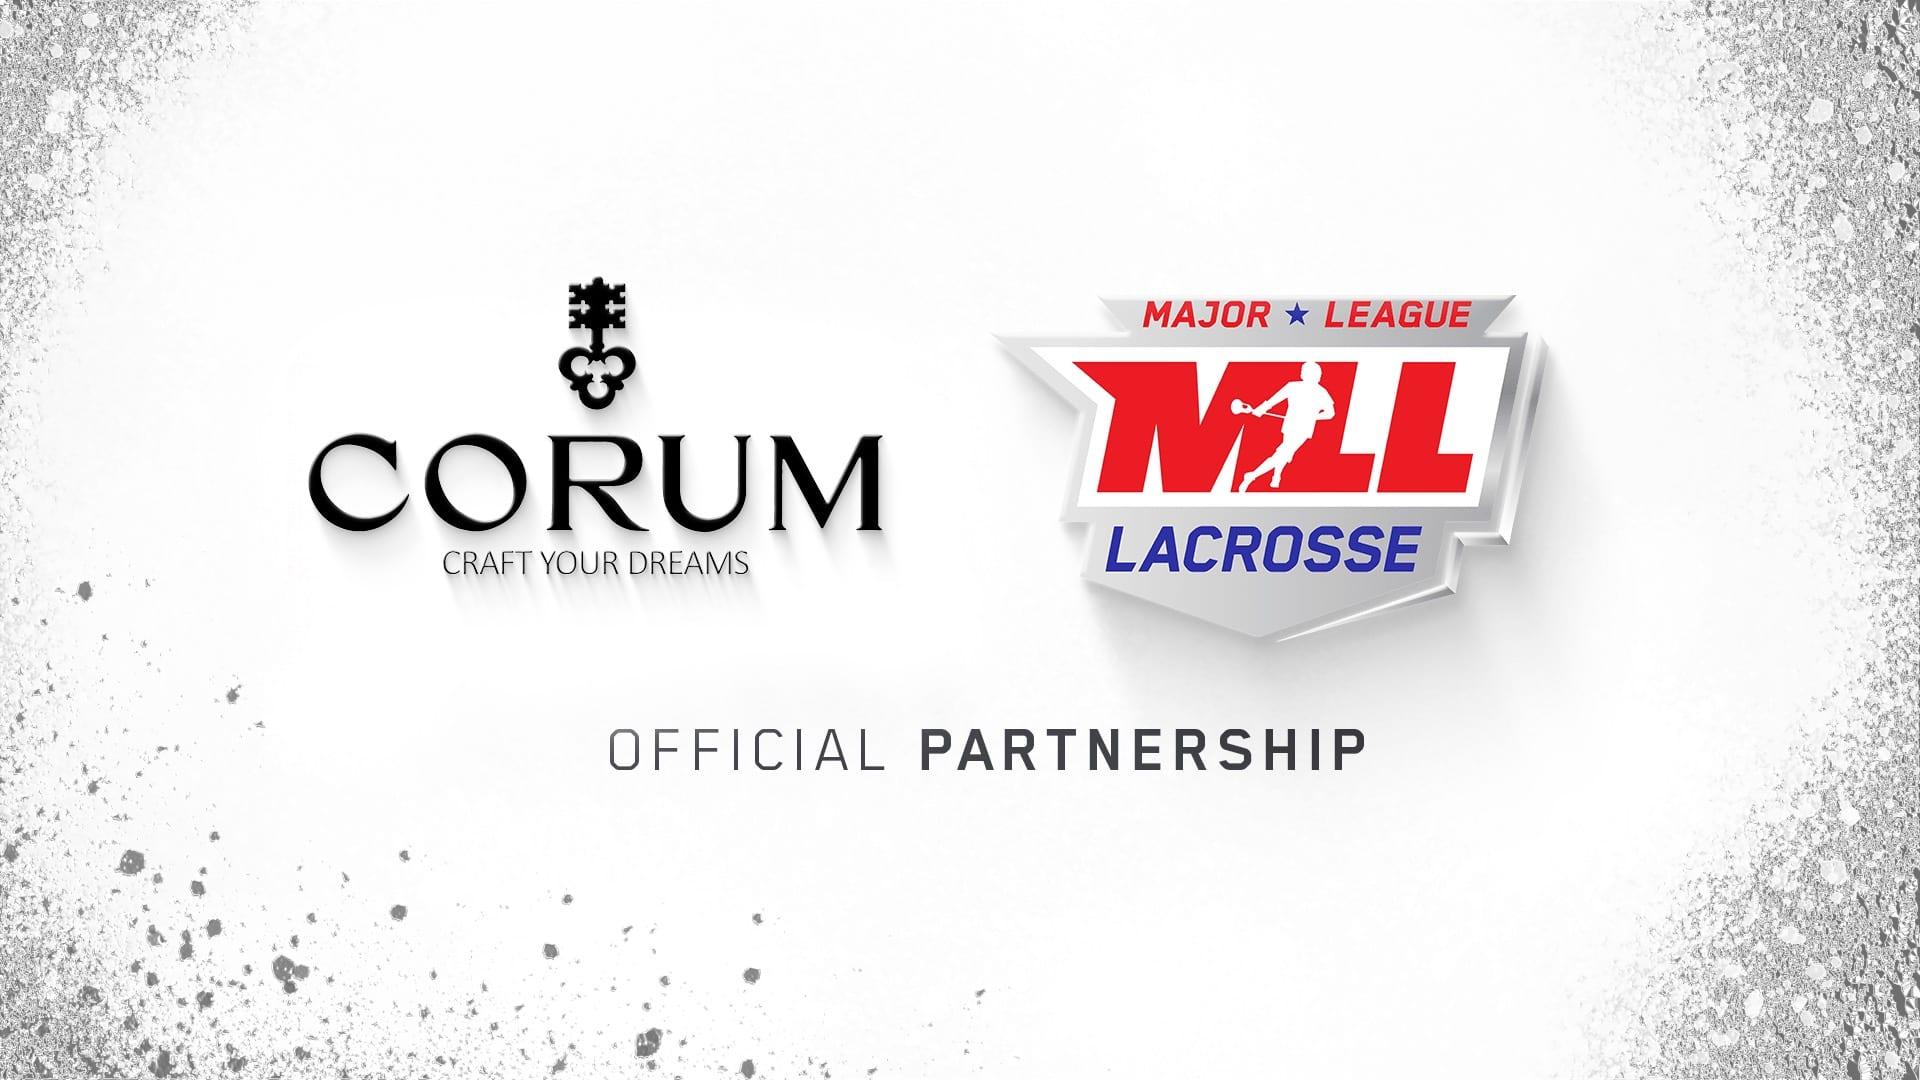 major league lacrosse corum